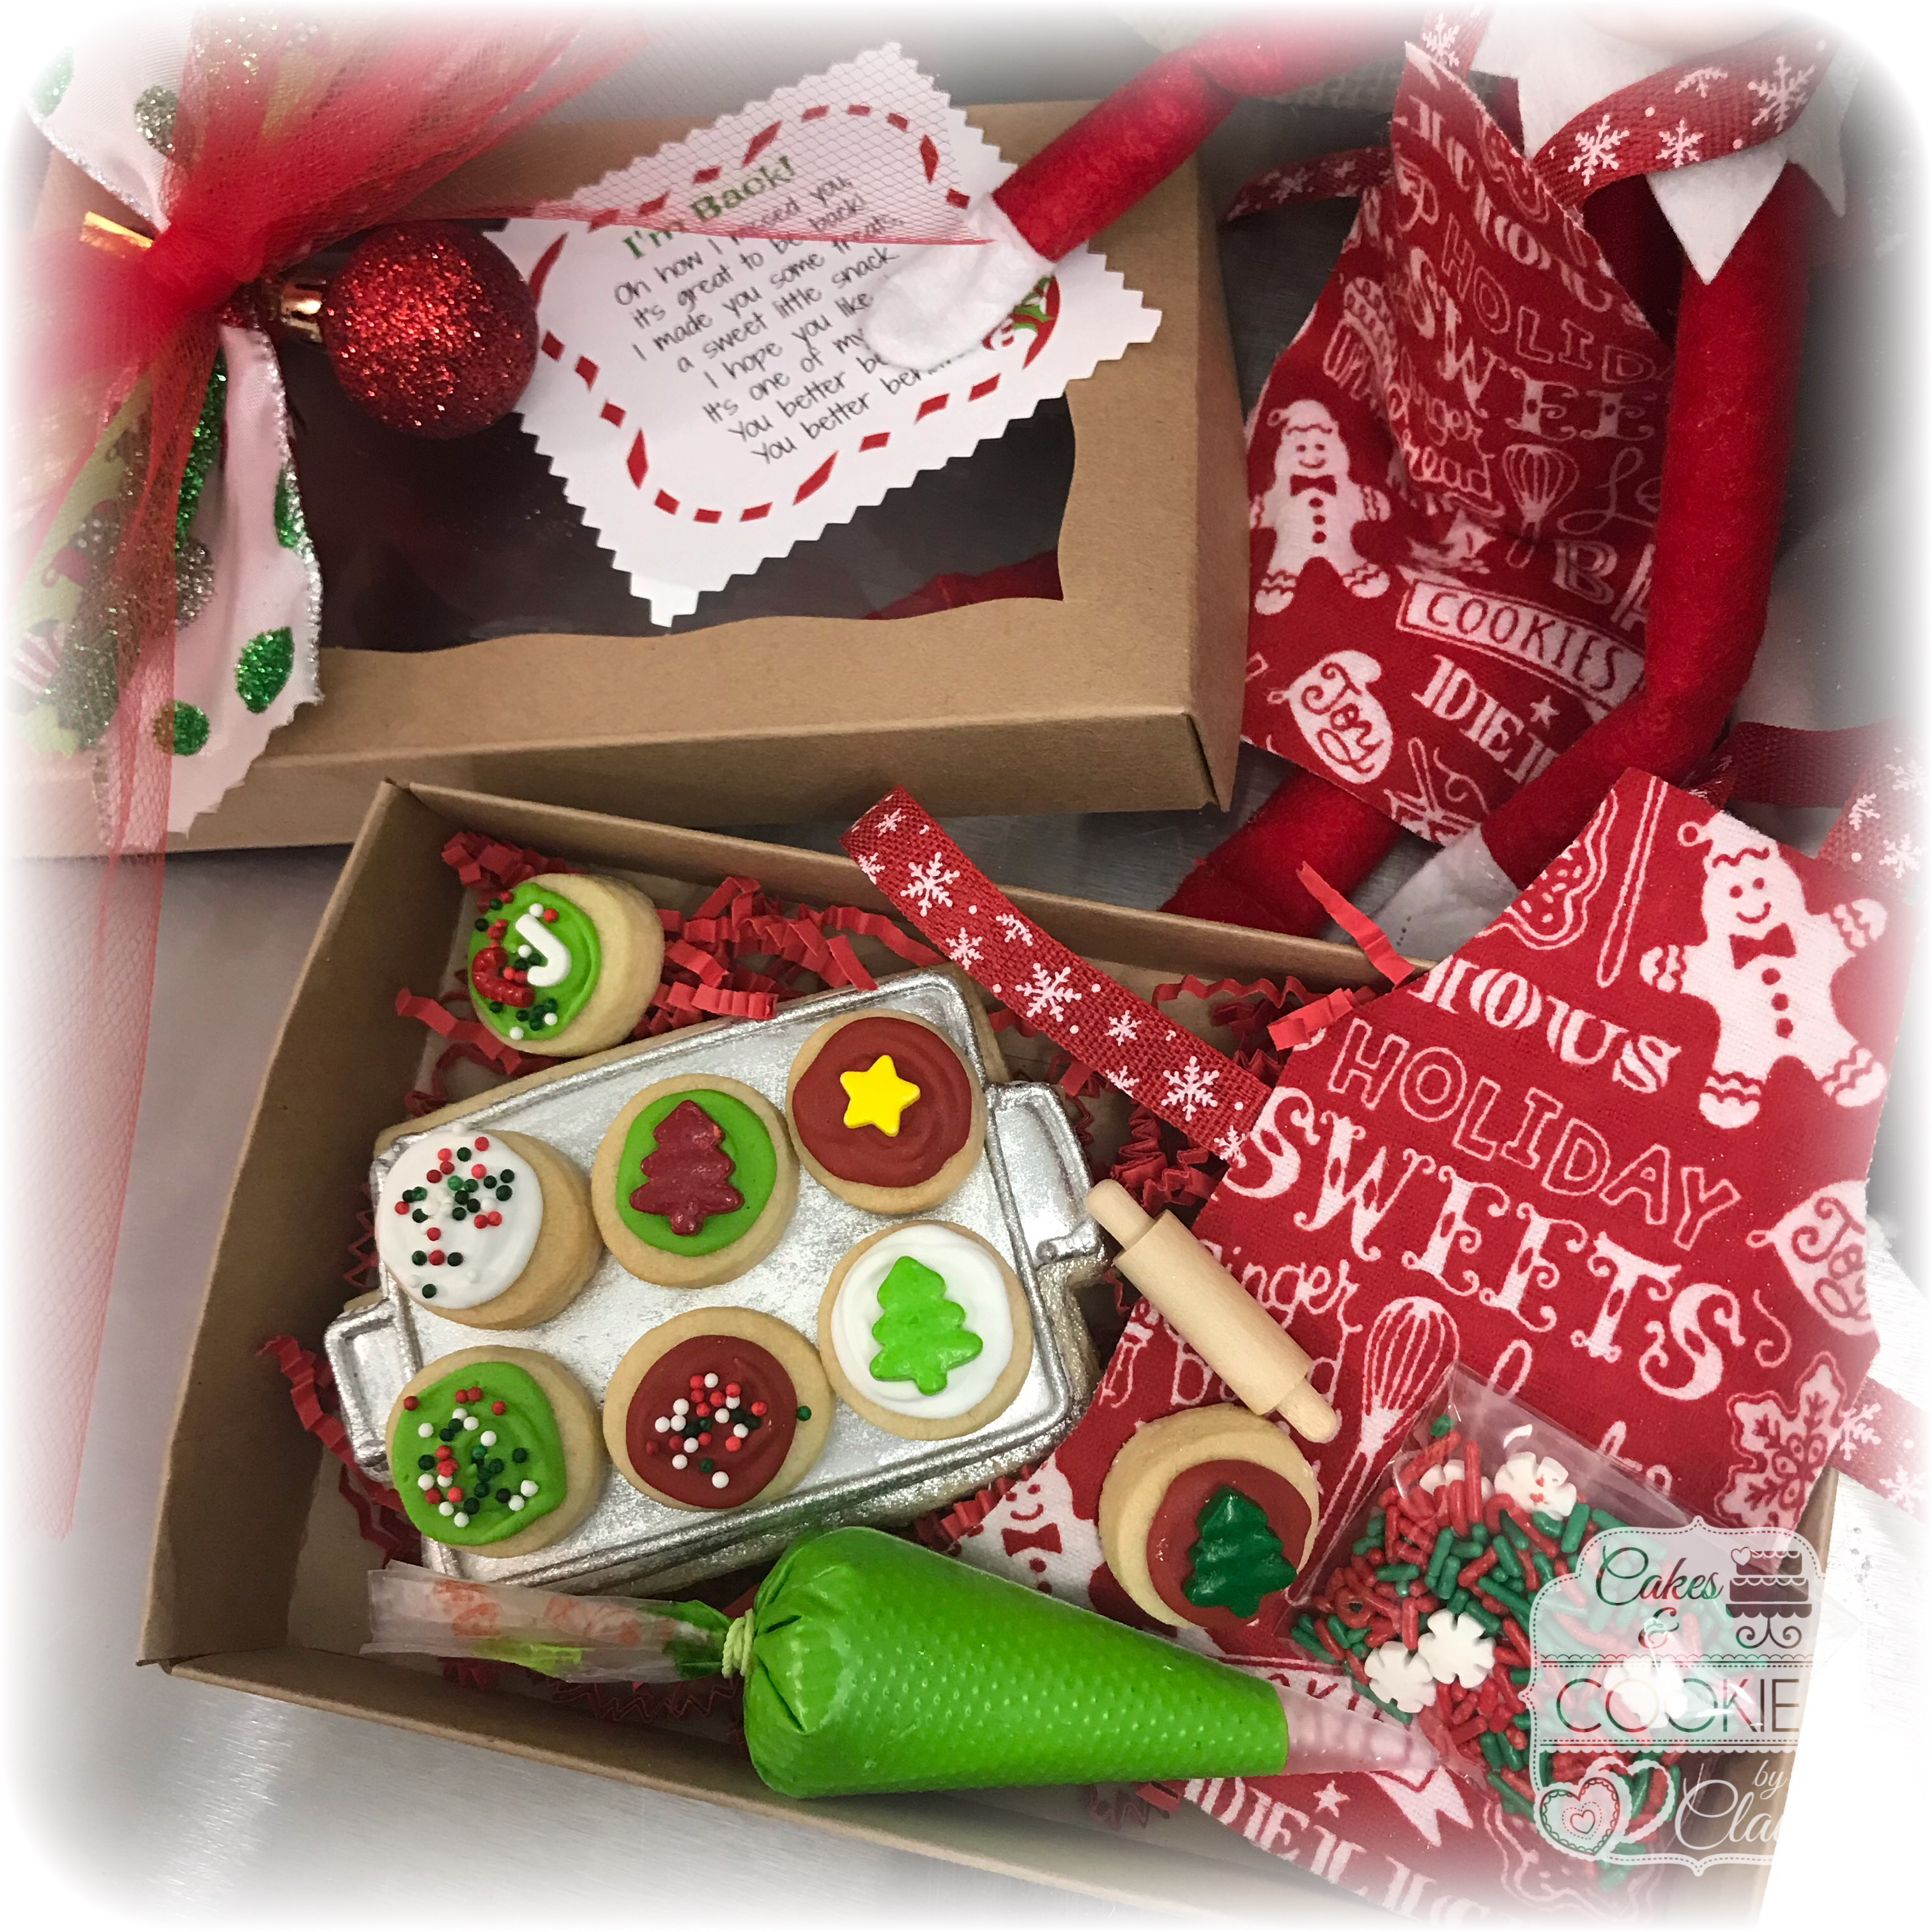 Elf on the Shelf Baking Cookie Set 1